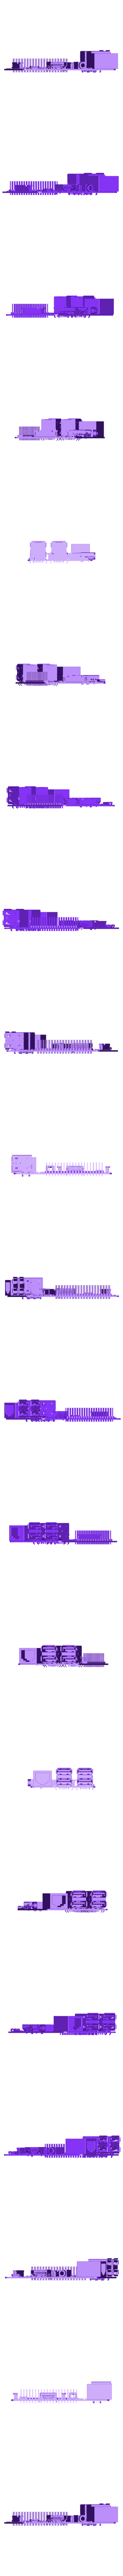 TAZ_5_Raspberry_Pi_3_Mount_-_Raspberry_Pi_Circuit_Board.stl Download free STL file TAZ 5 Raspberry Pi 2 / 3 Main Box Extension • 3D print template, crprinting